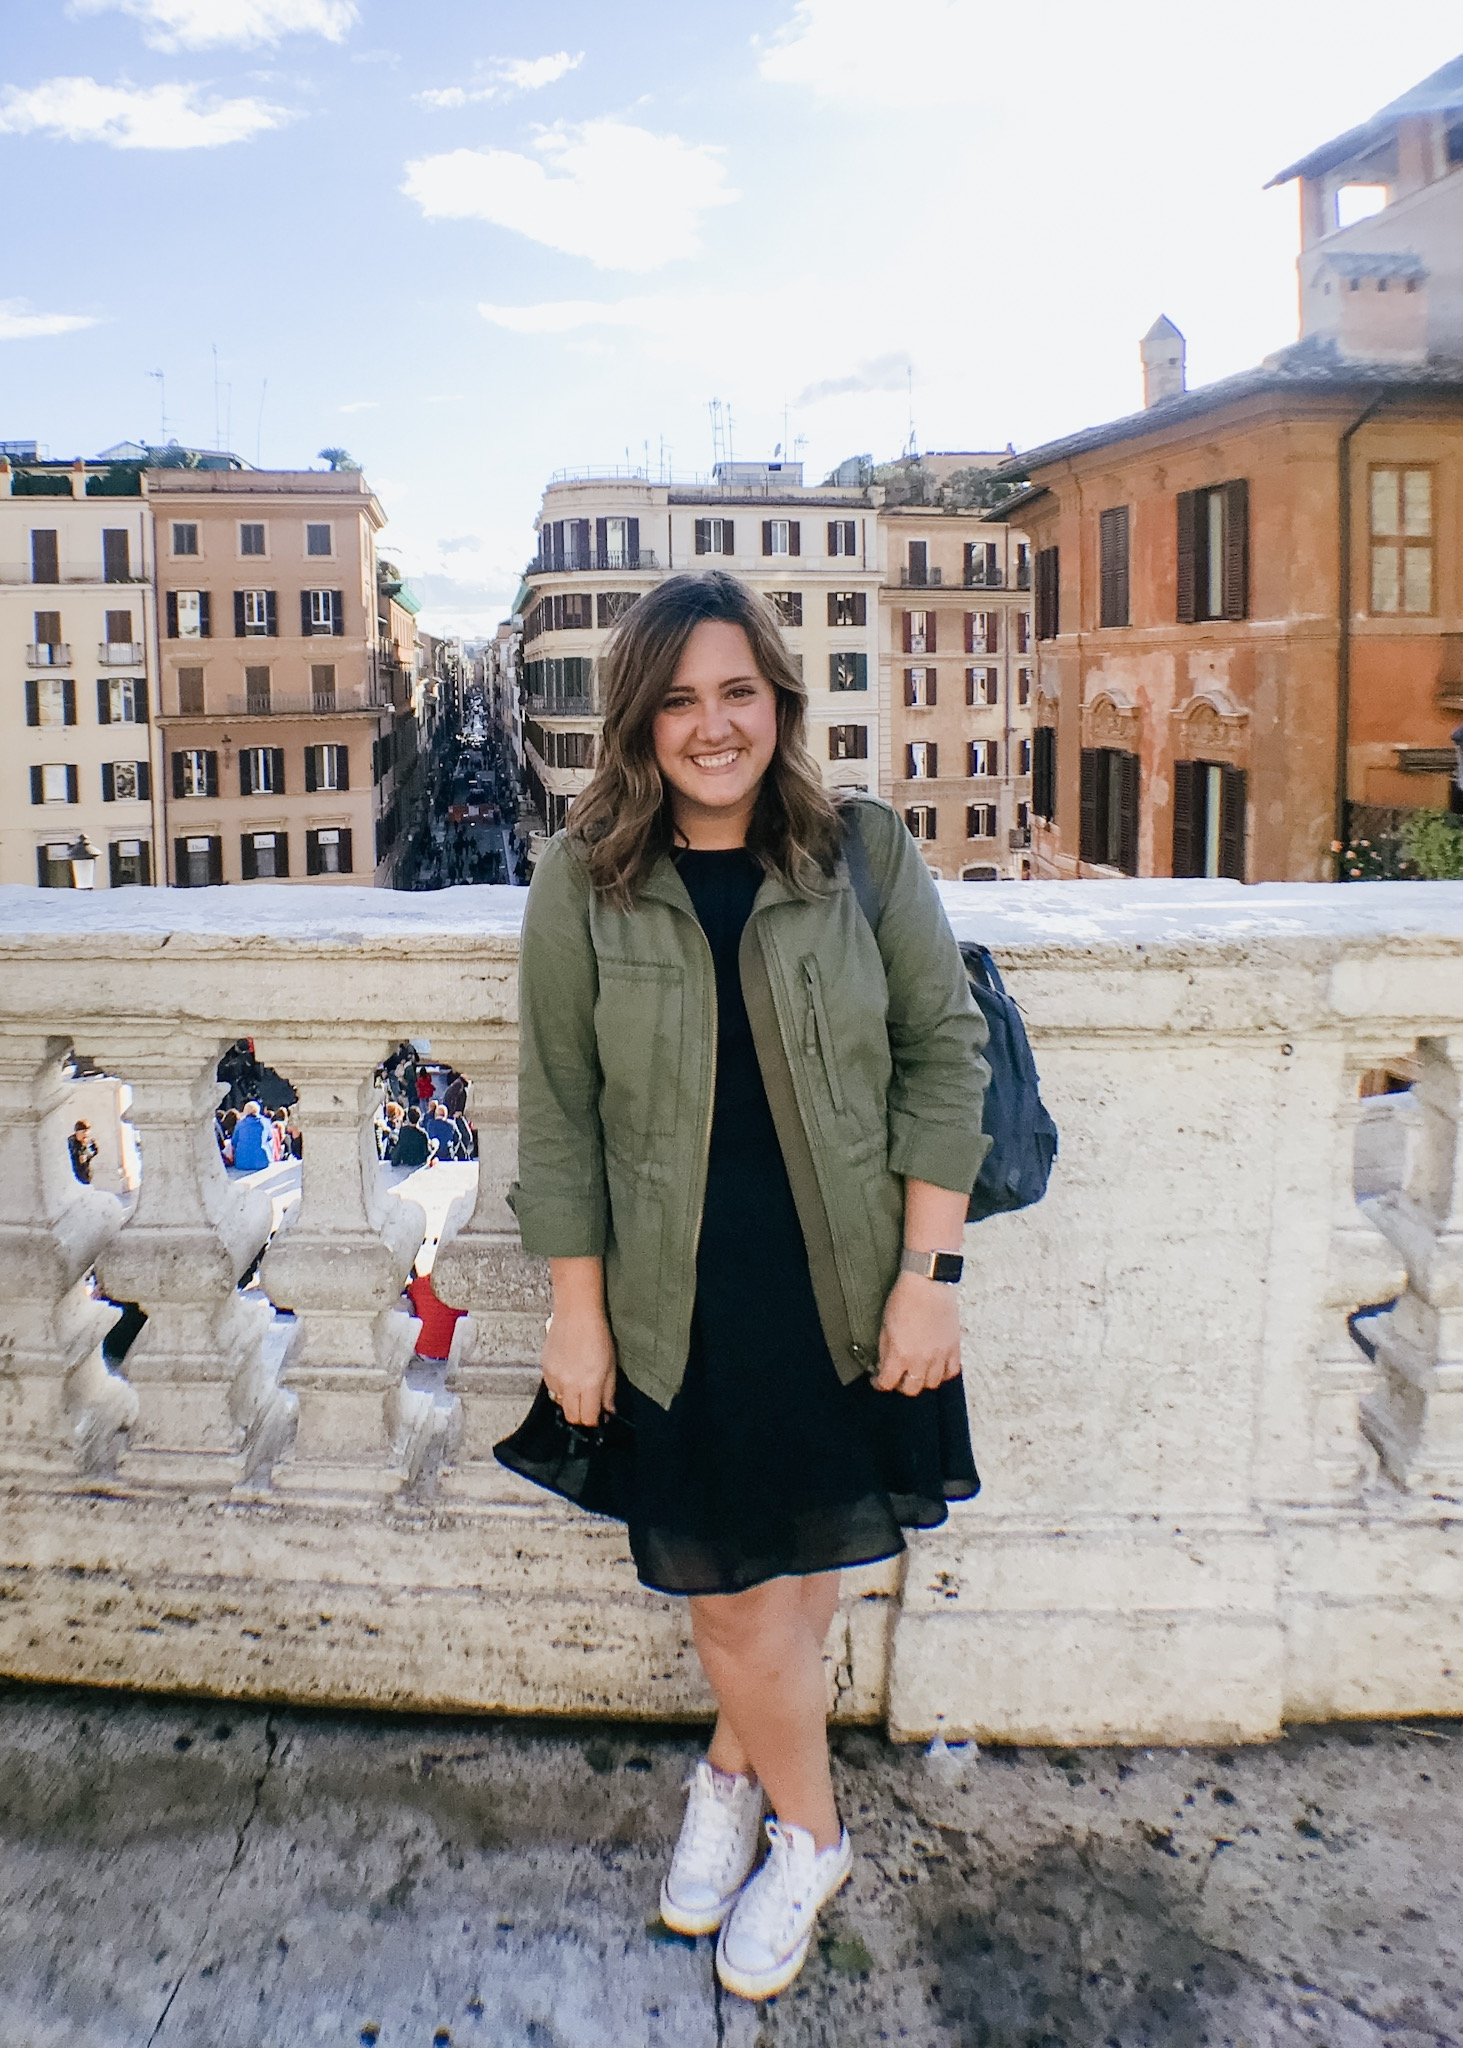 Rome Spanish Steps gennean